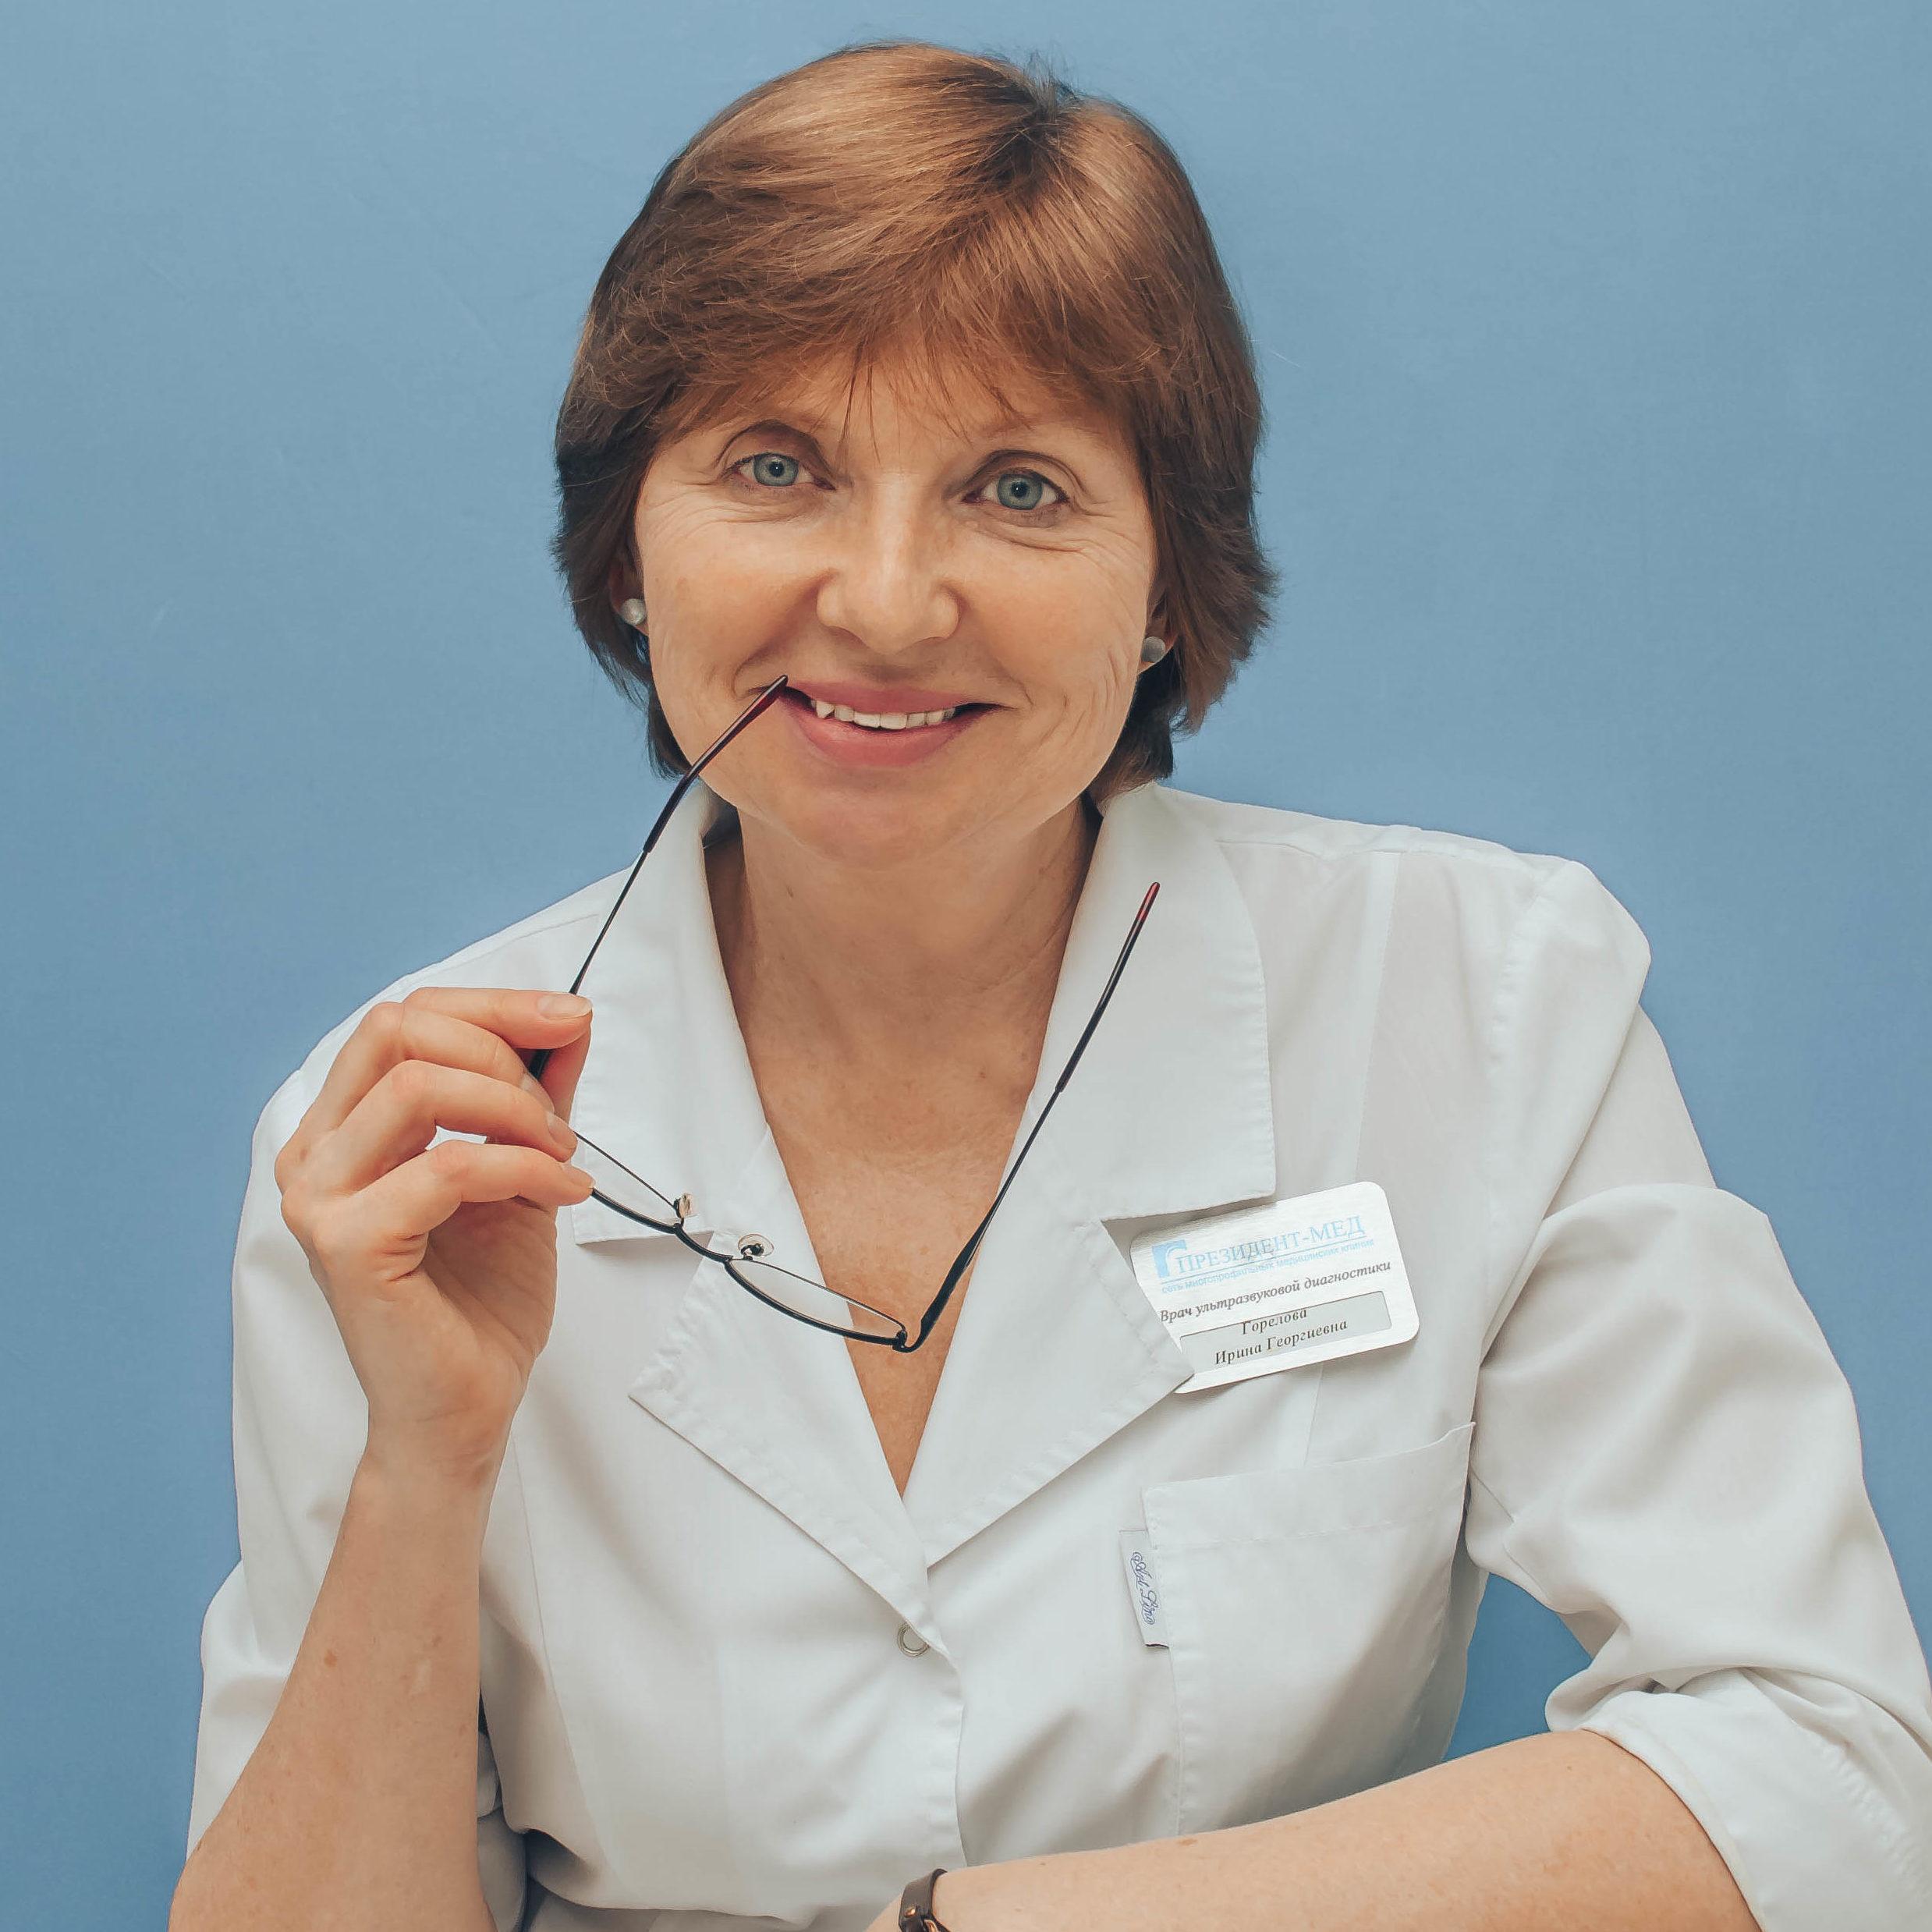 Горелова Ирина Георгиевна, врач-УЗИ диагностики